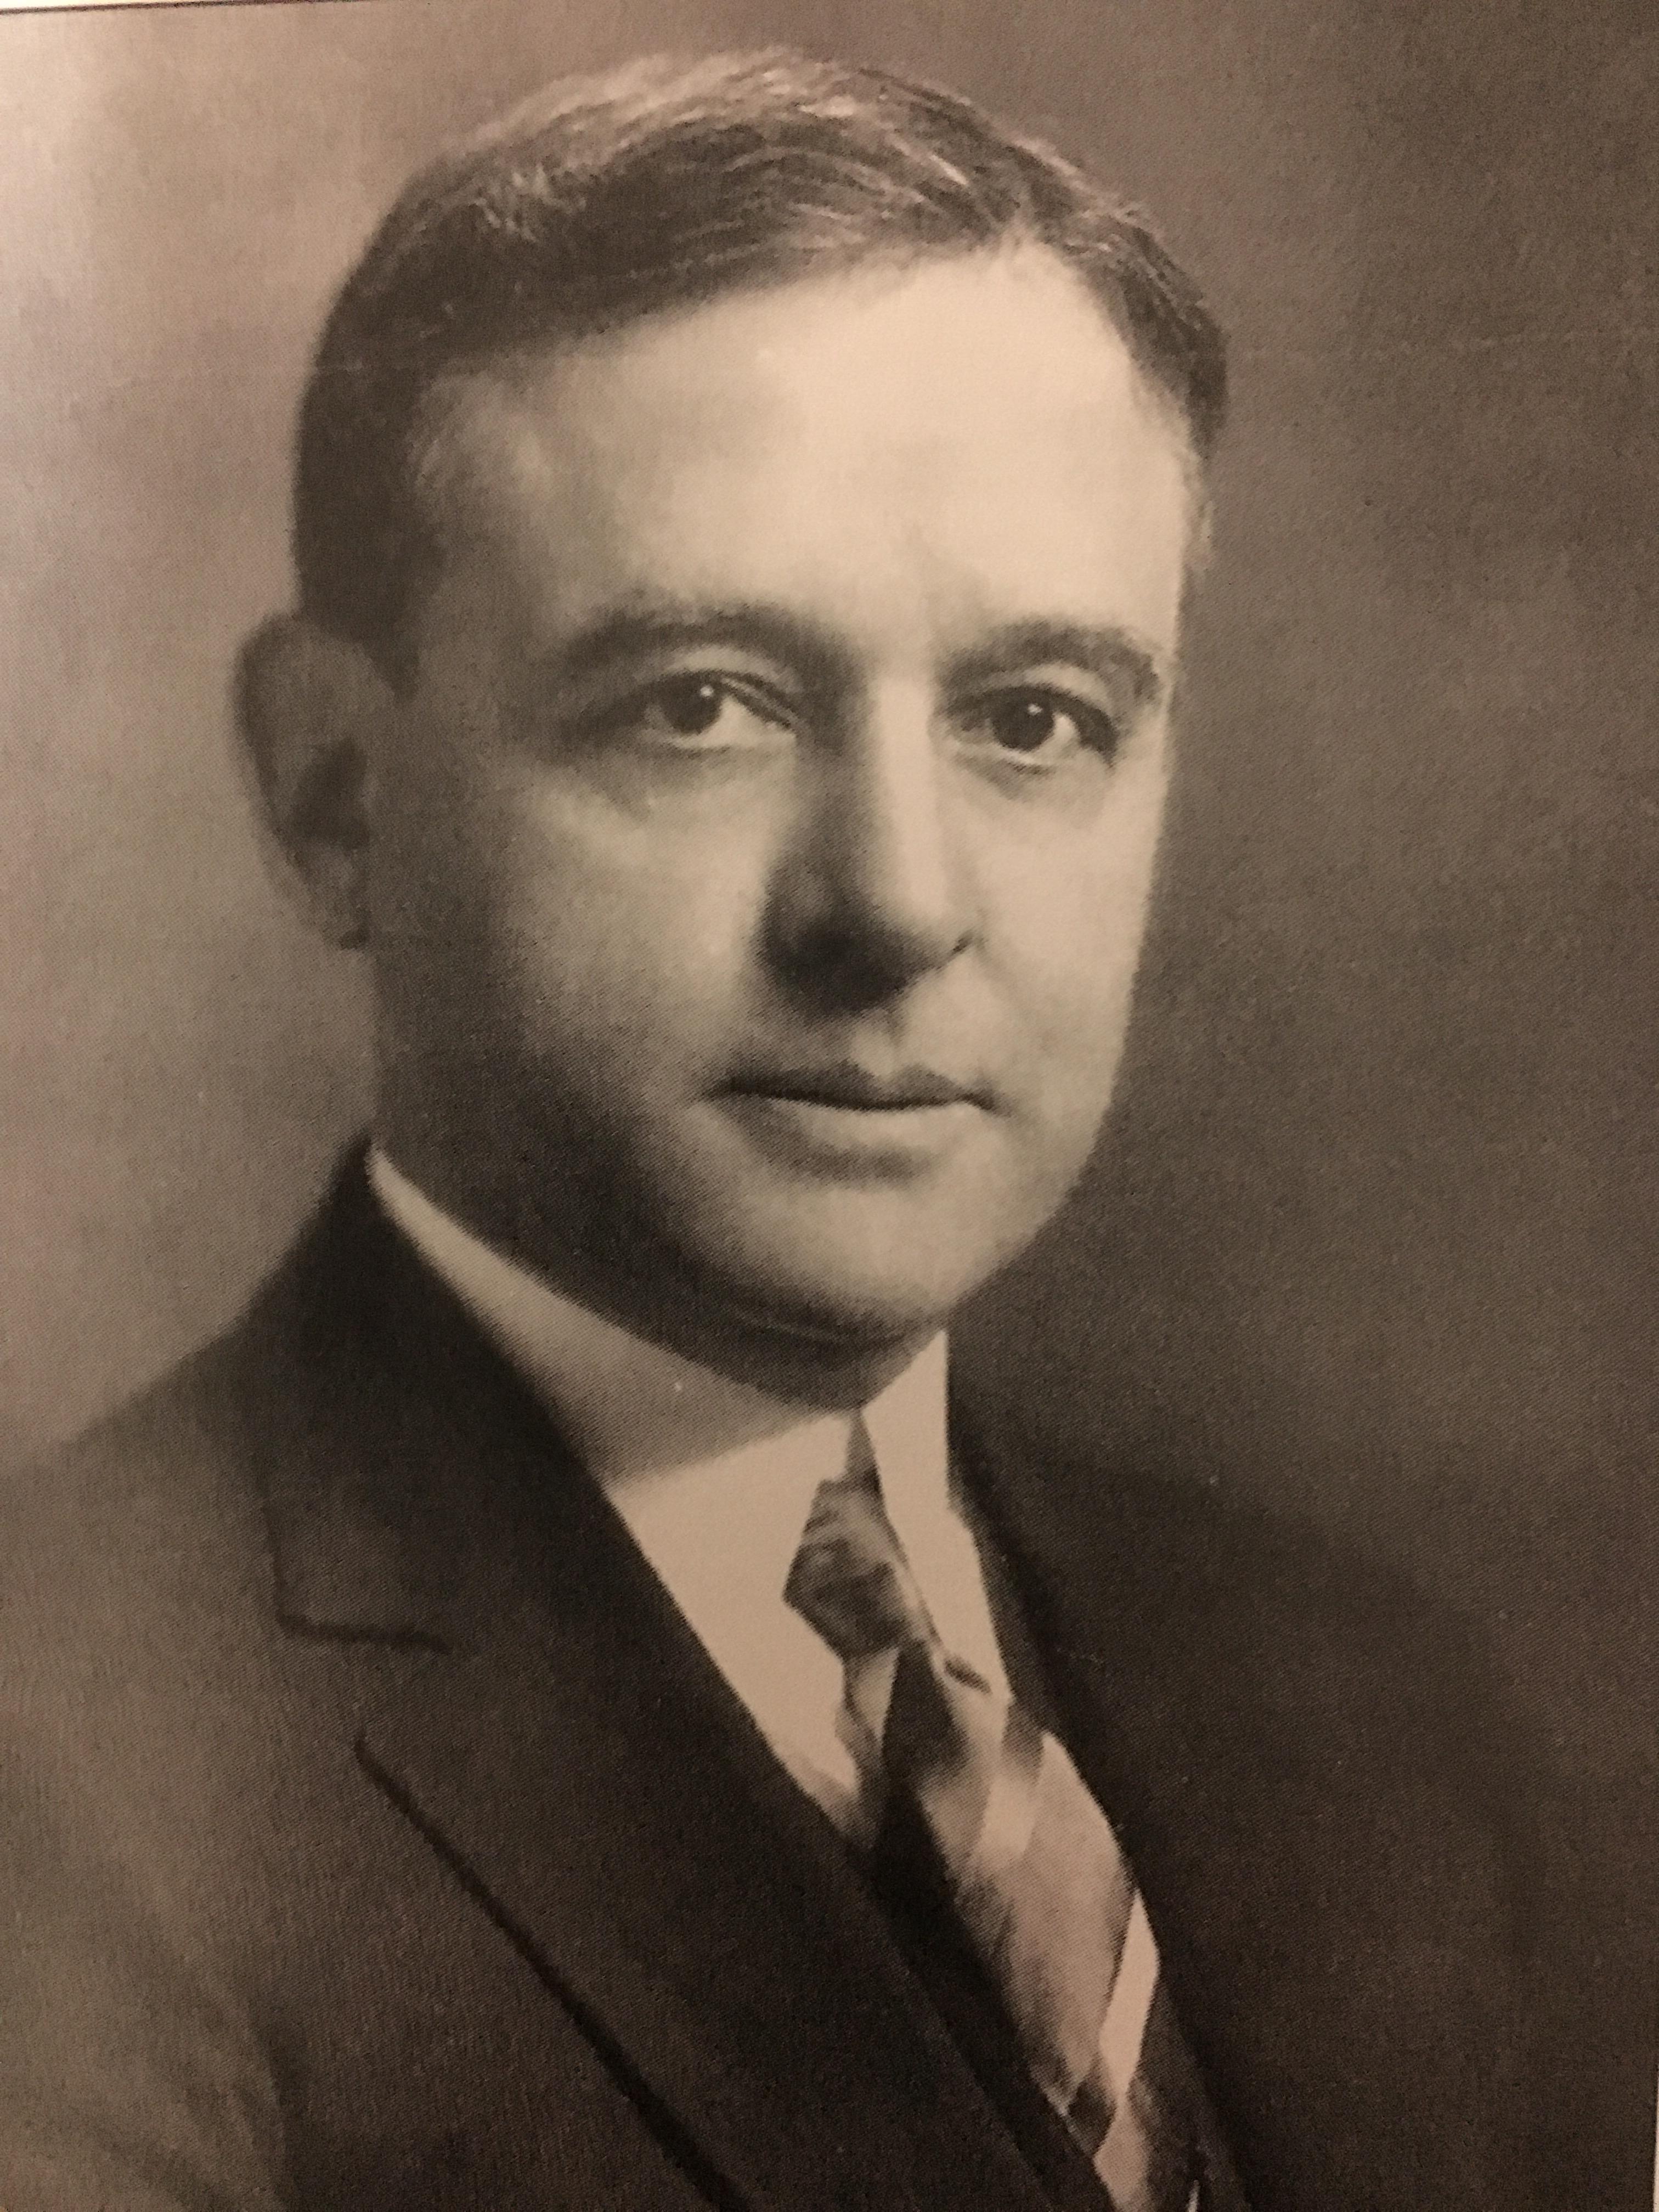 Alfred Civilion Fones